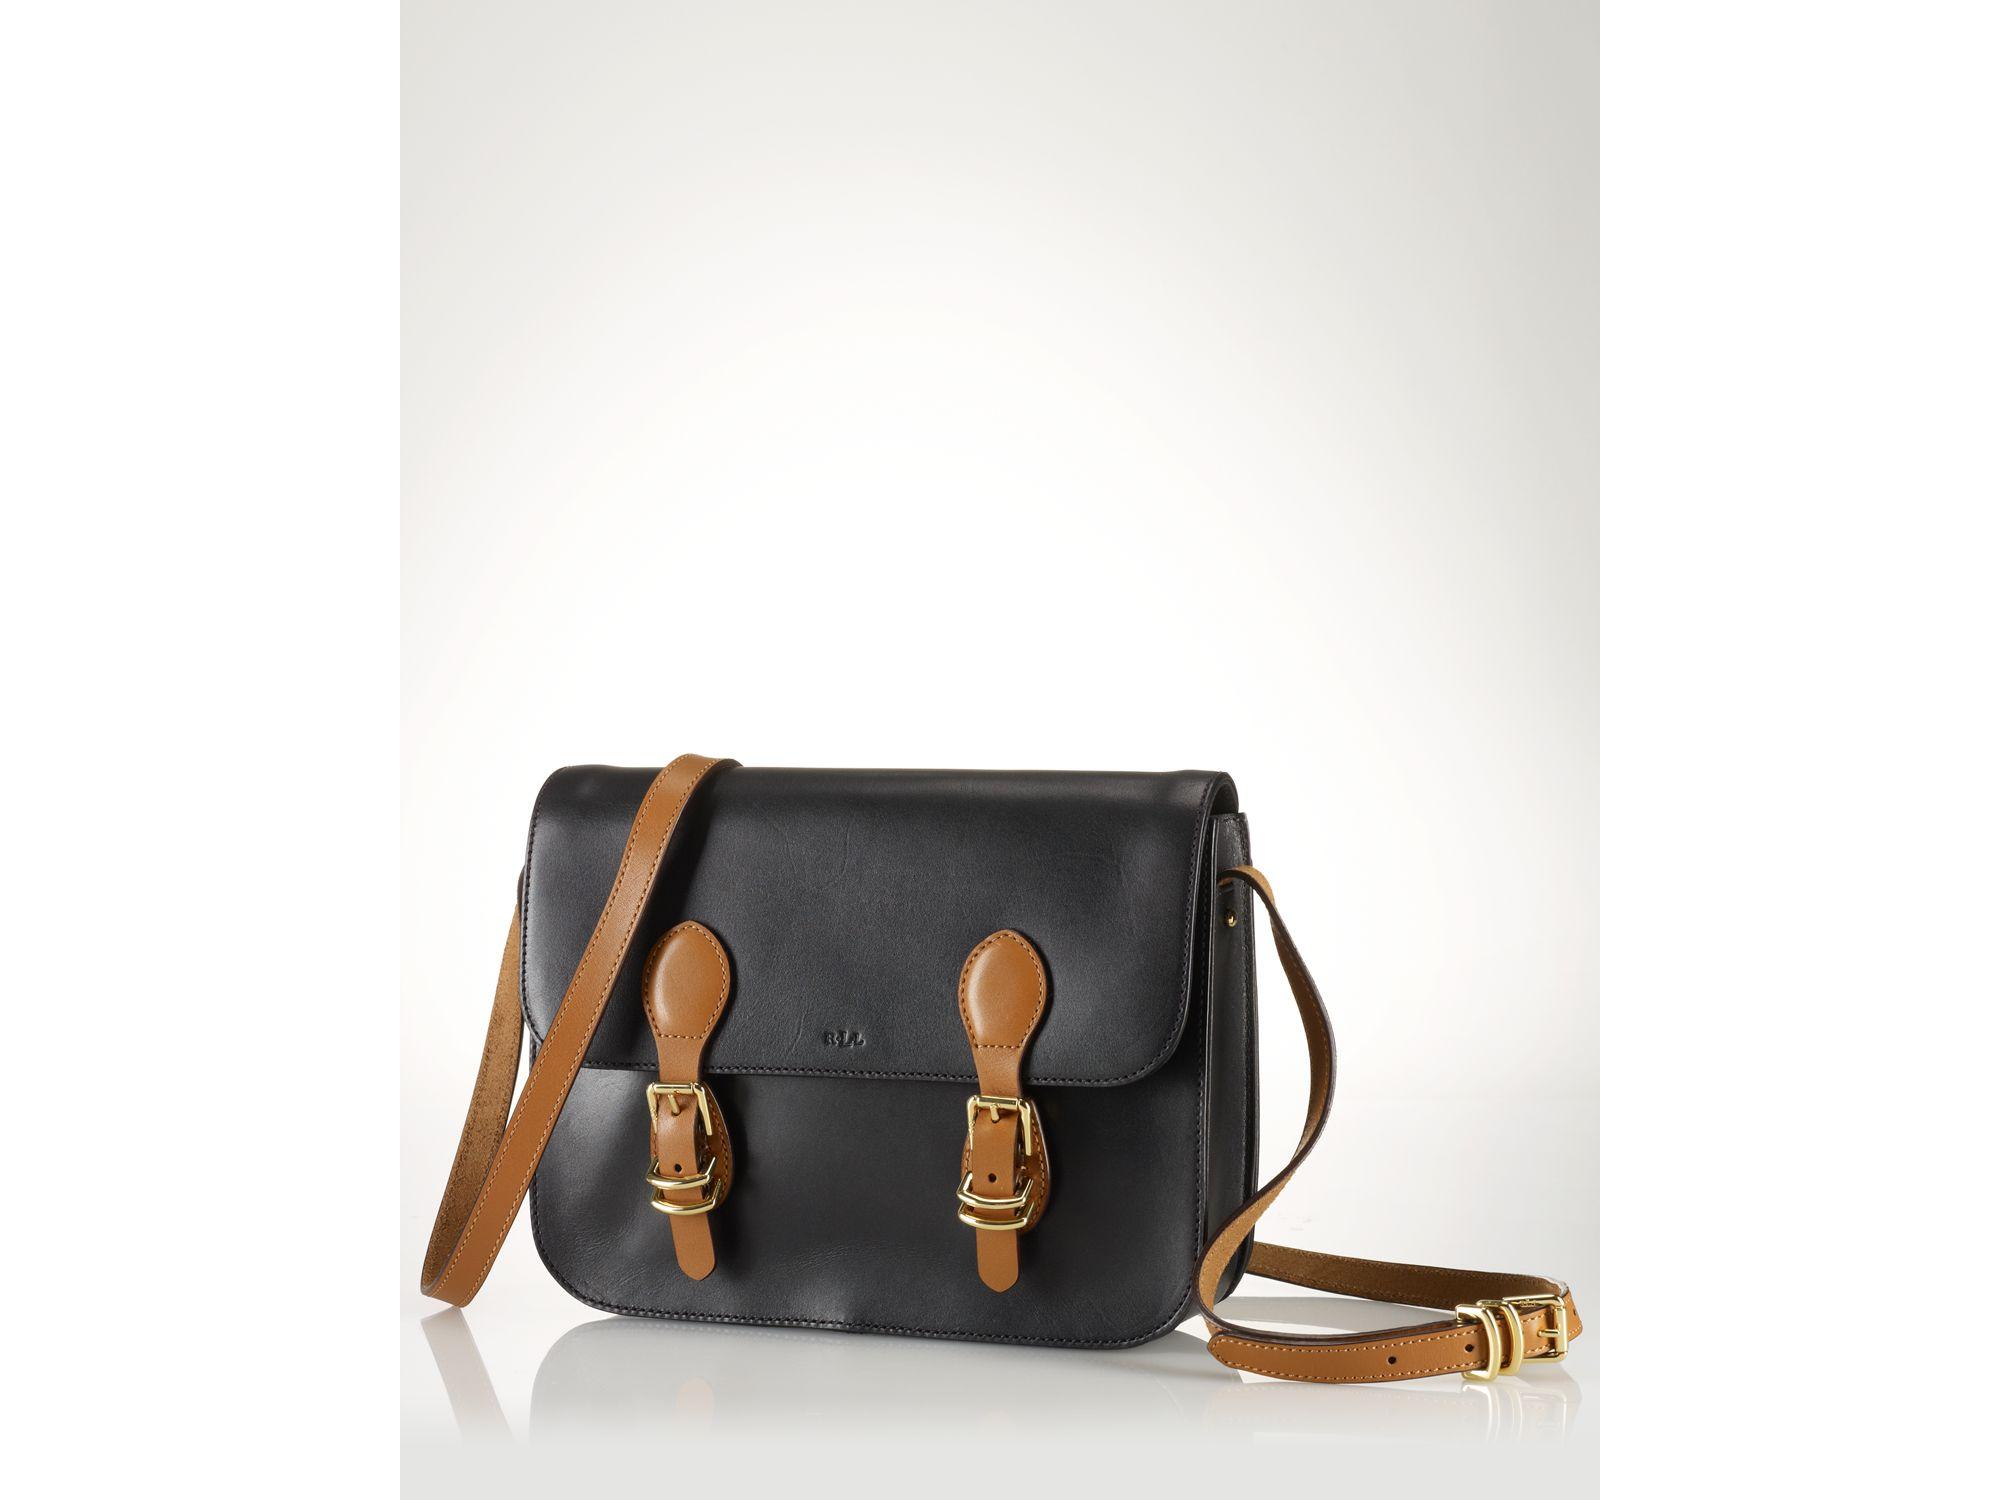 054a7fee60 Lyst - Lauren By Ralph Lauren Messenger Bag Bexley Heath Medium in Black